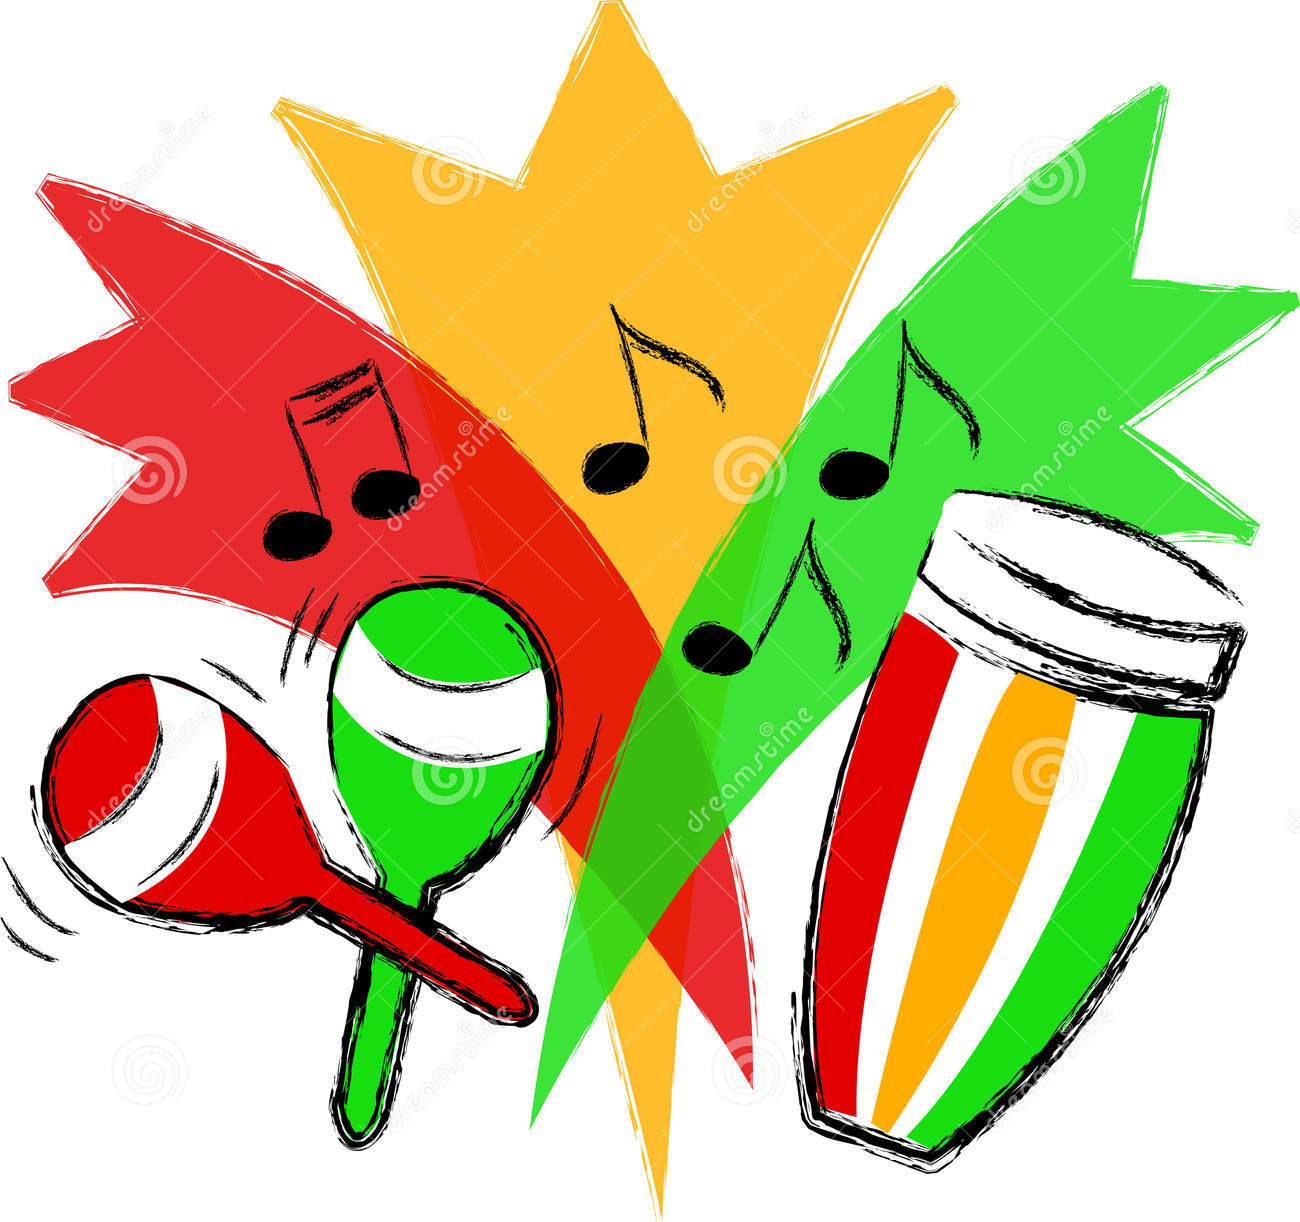 Maracas Clipart A Conga Drum And Maracas-Maracas Clipart A Conga Drum And Maracas-13